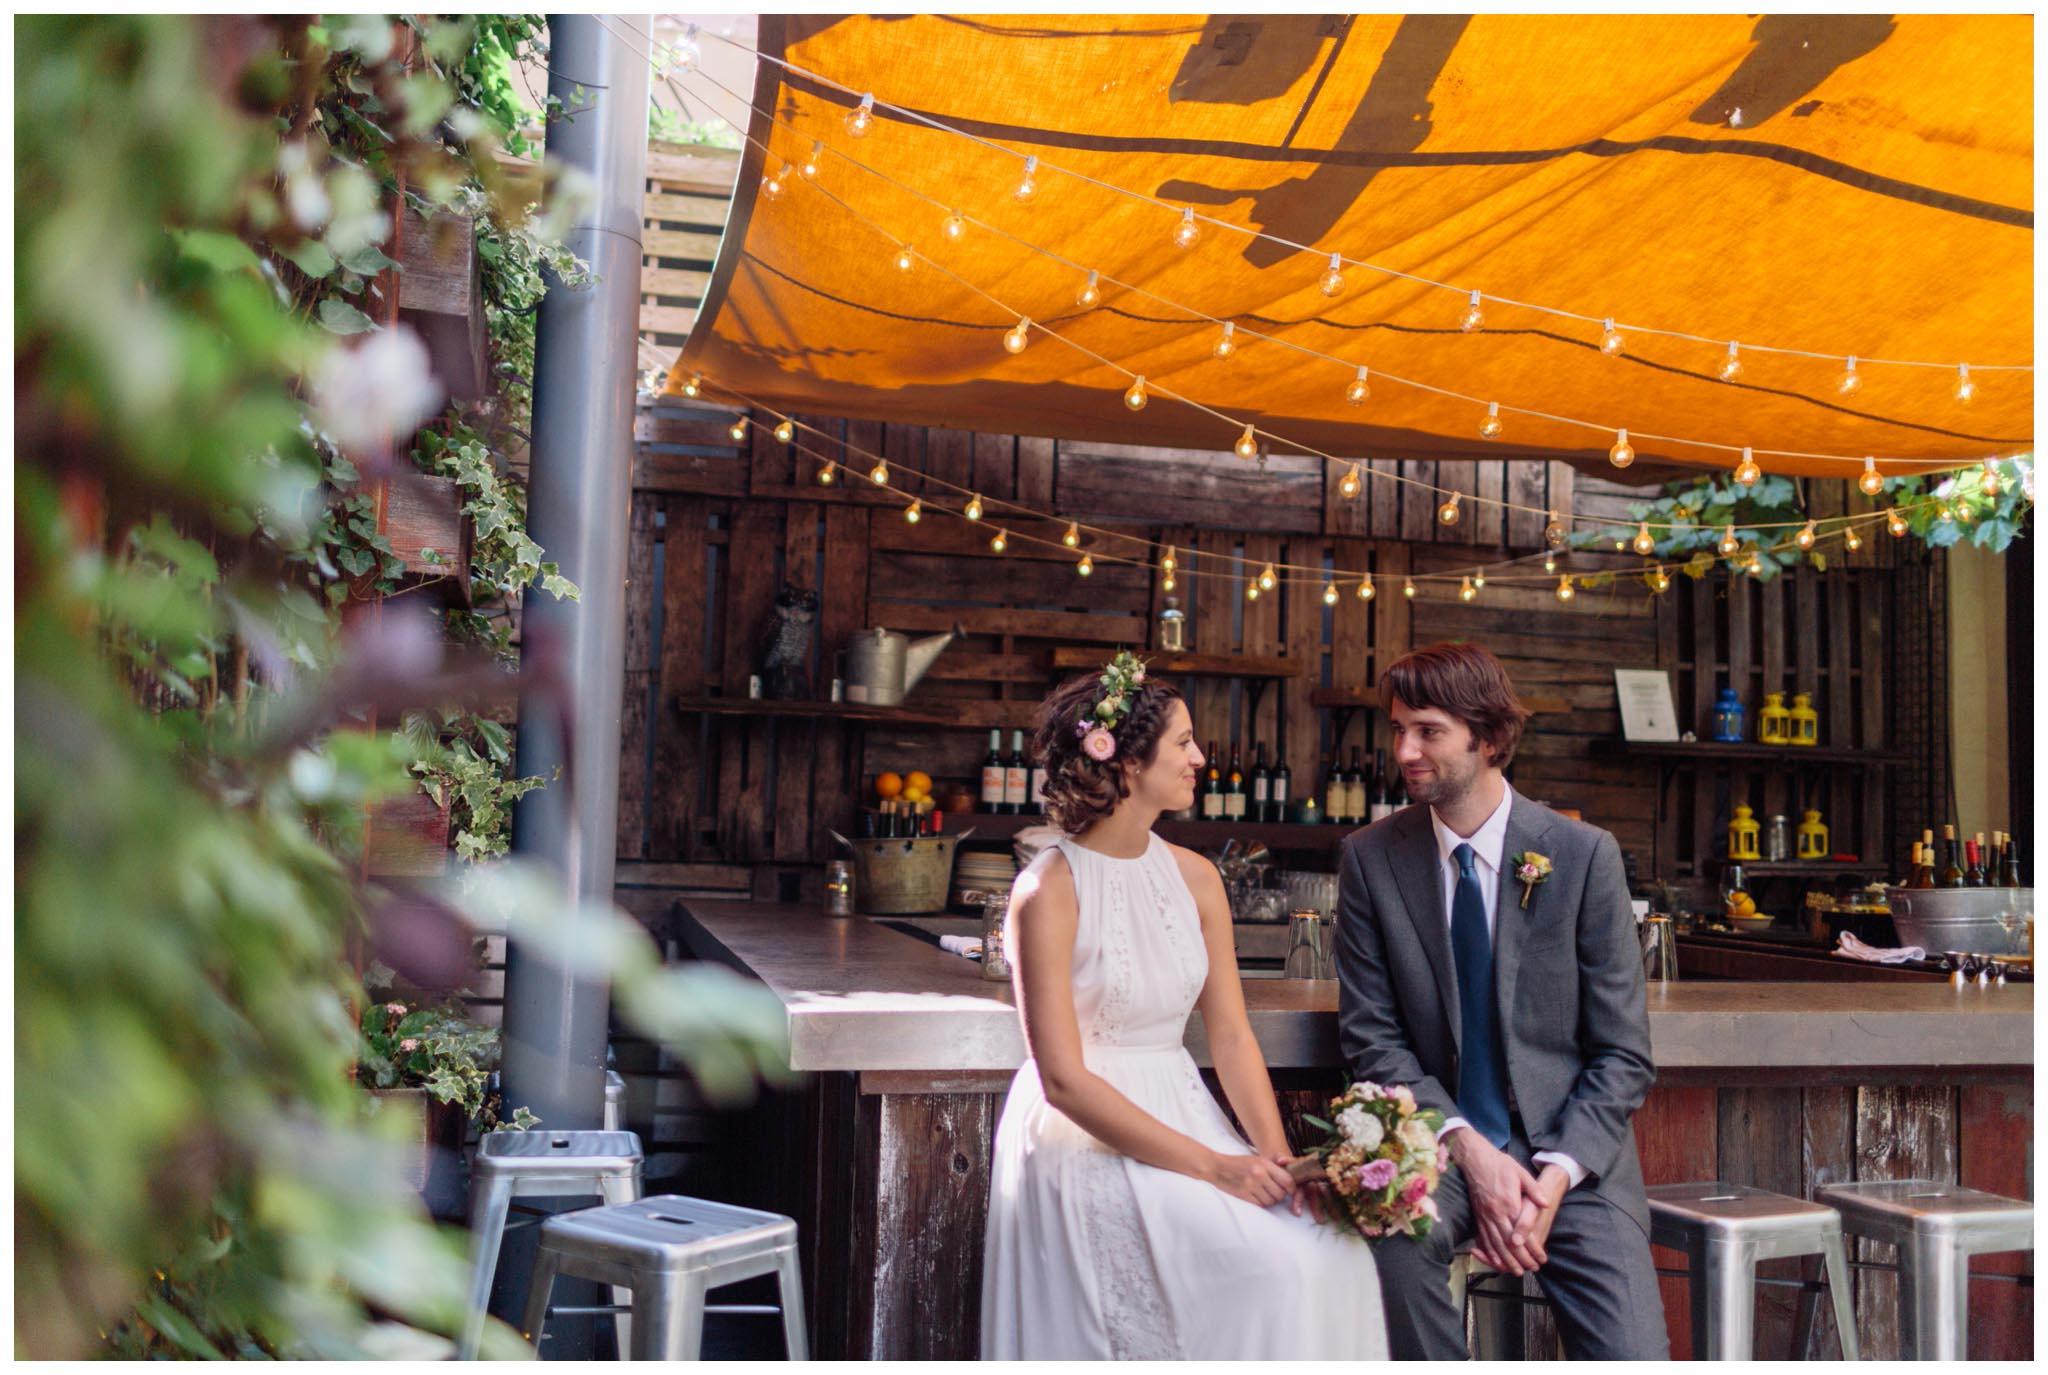 Talula's Garden, wedding